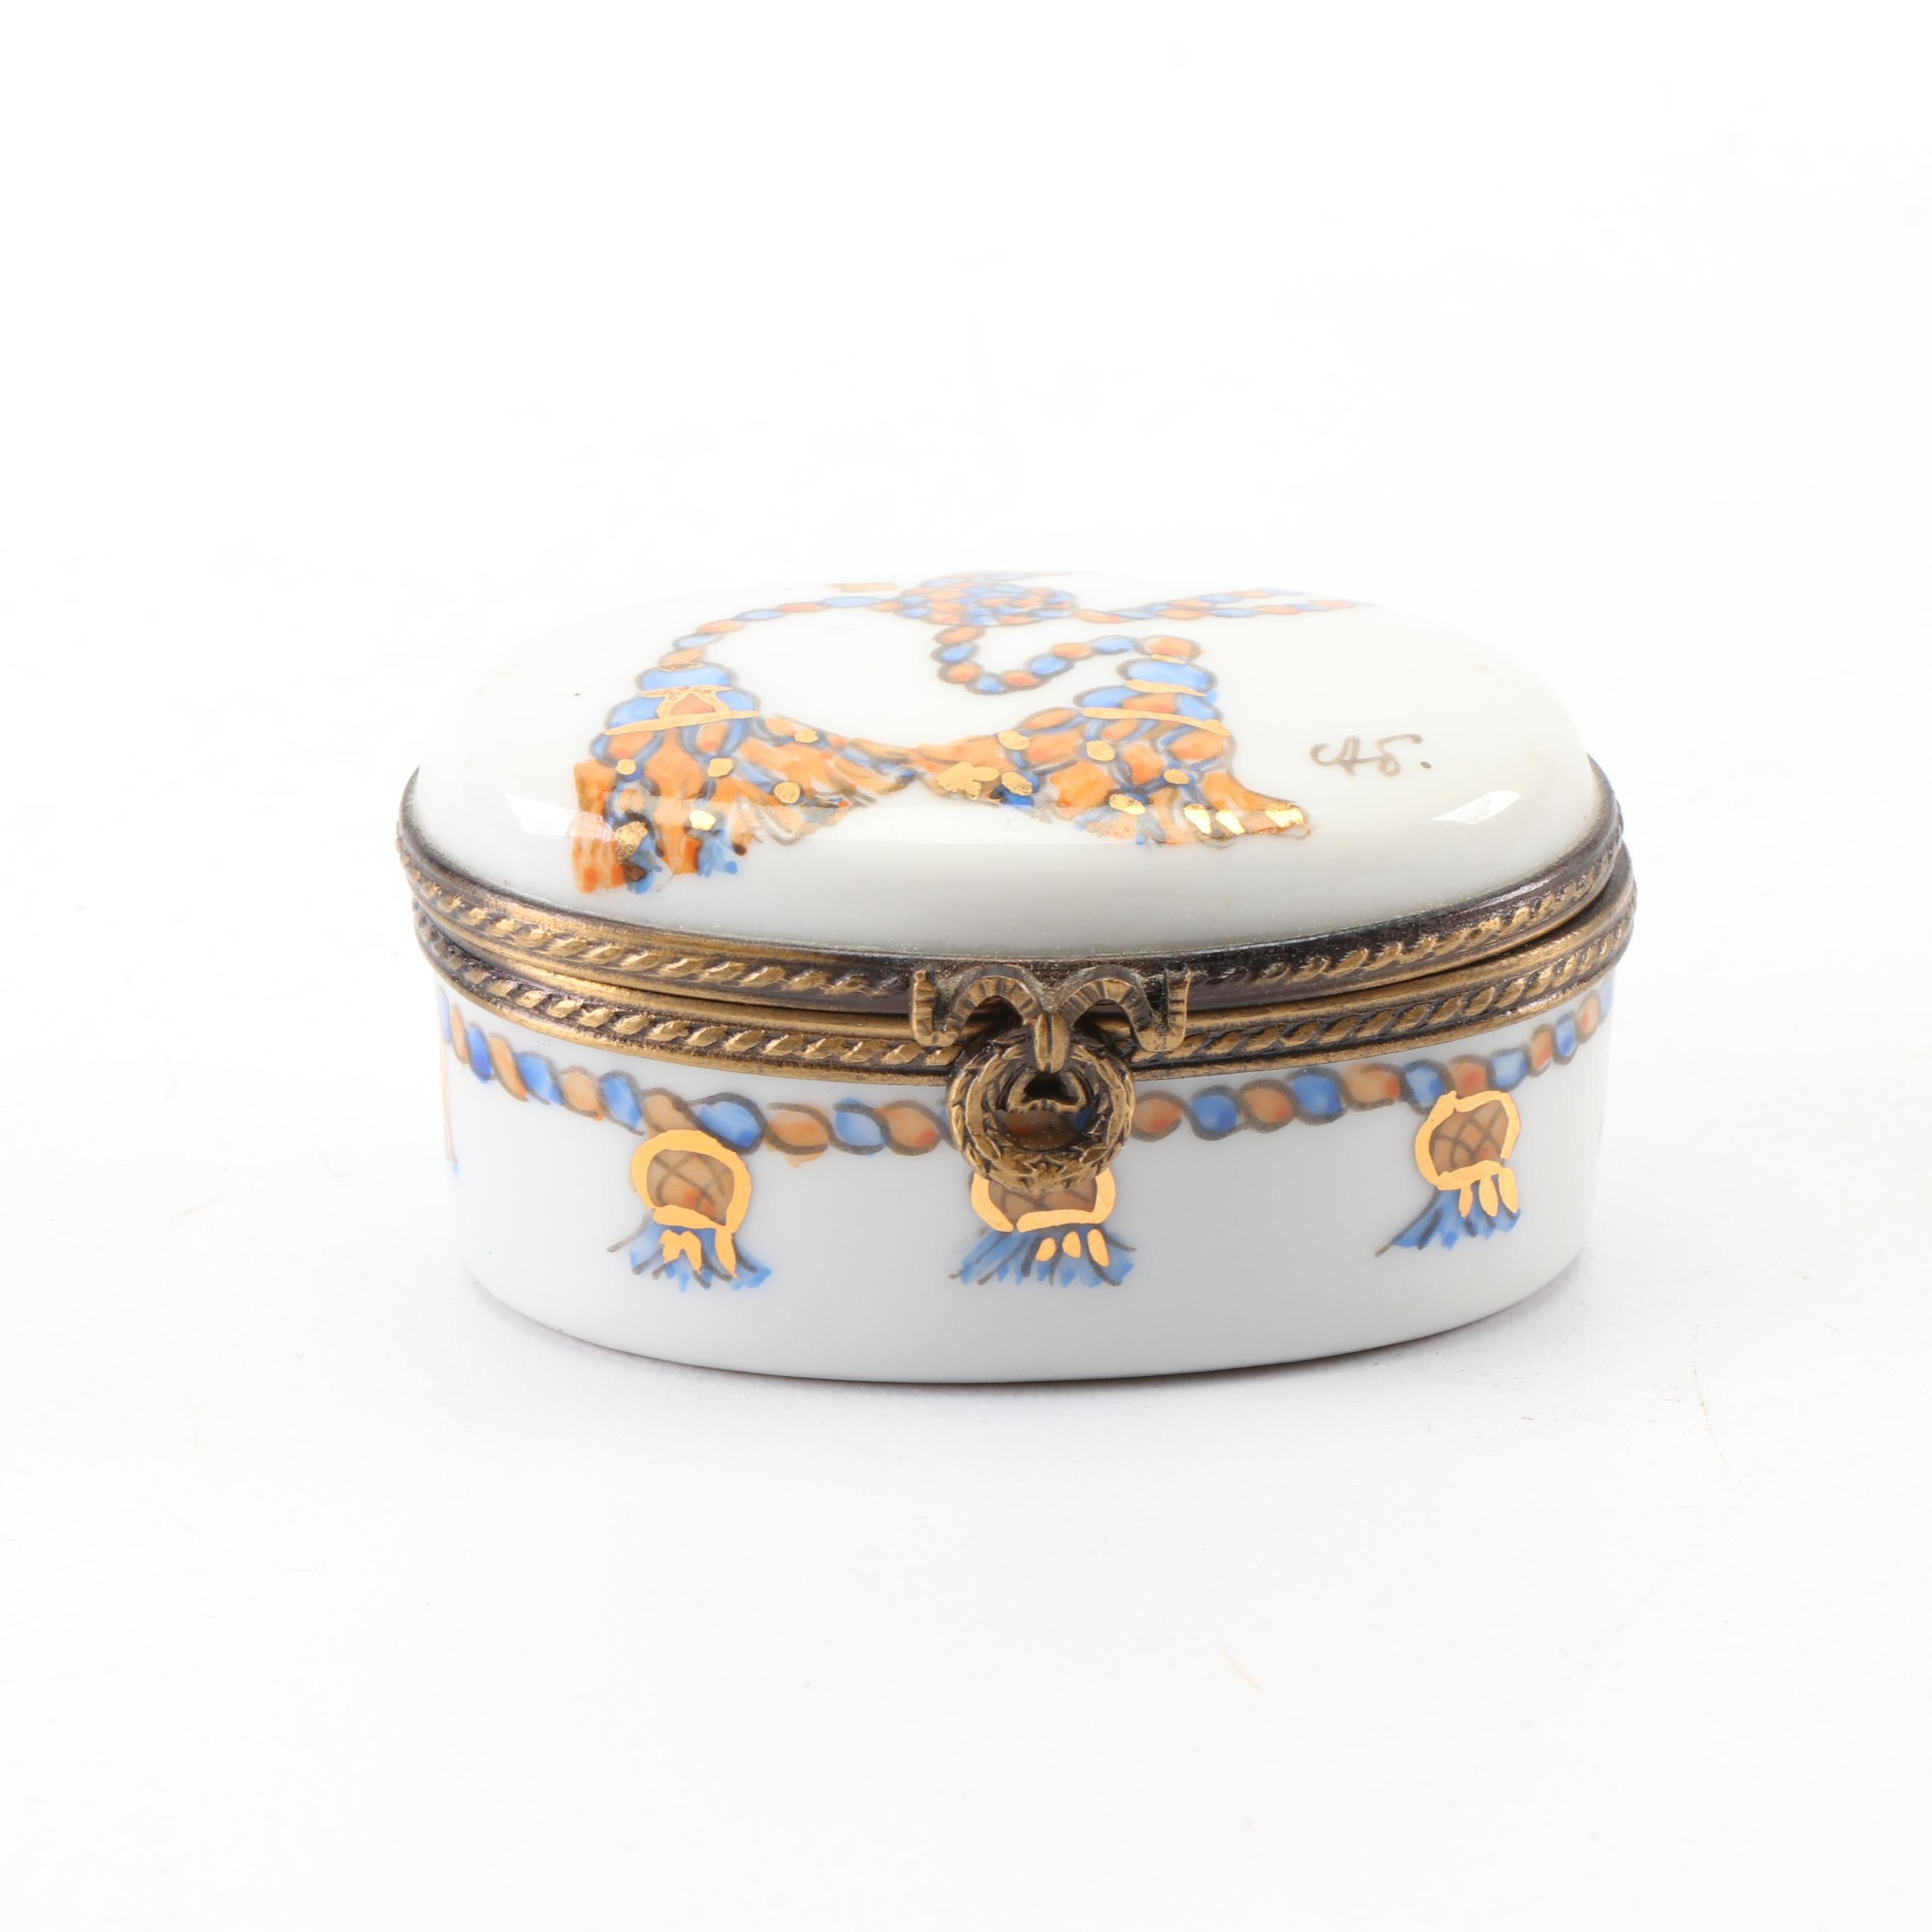 Limoges Hand-Painted Porcelain Trinket Box